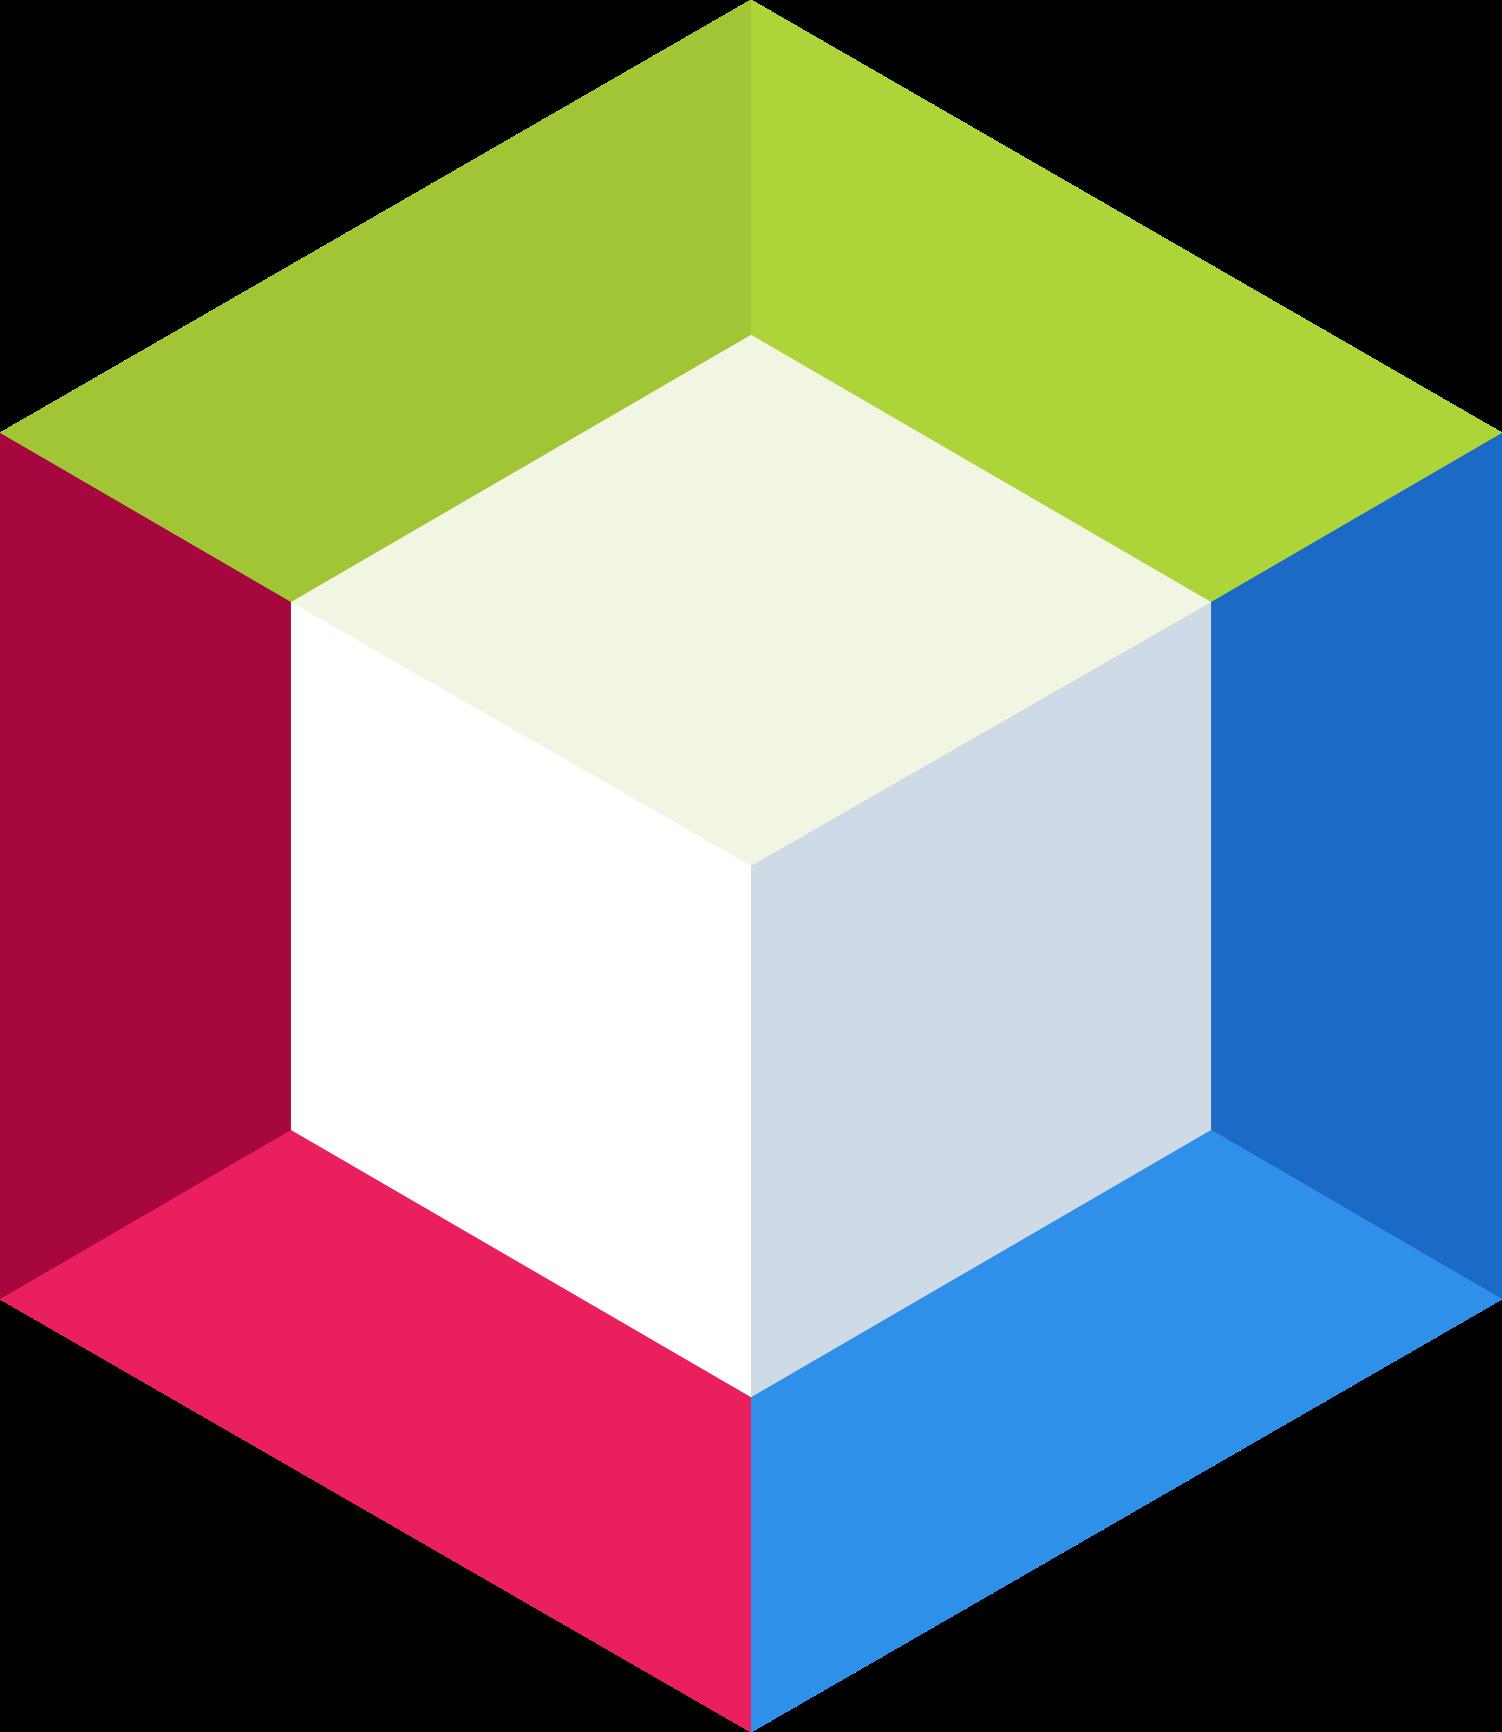 NetBeans IDE 7.4 Beta